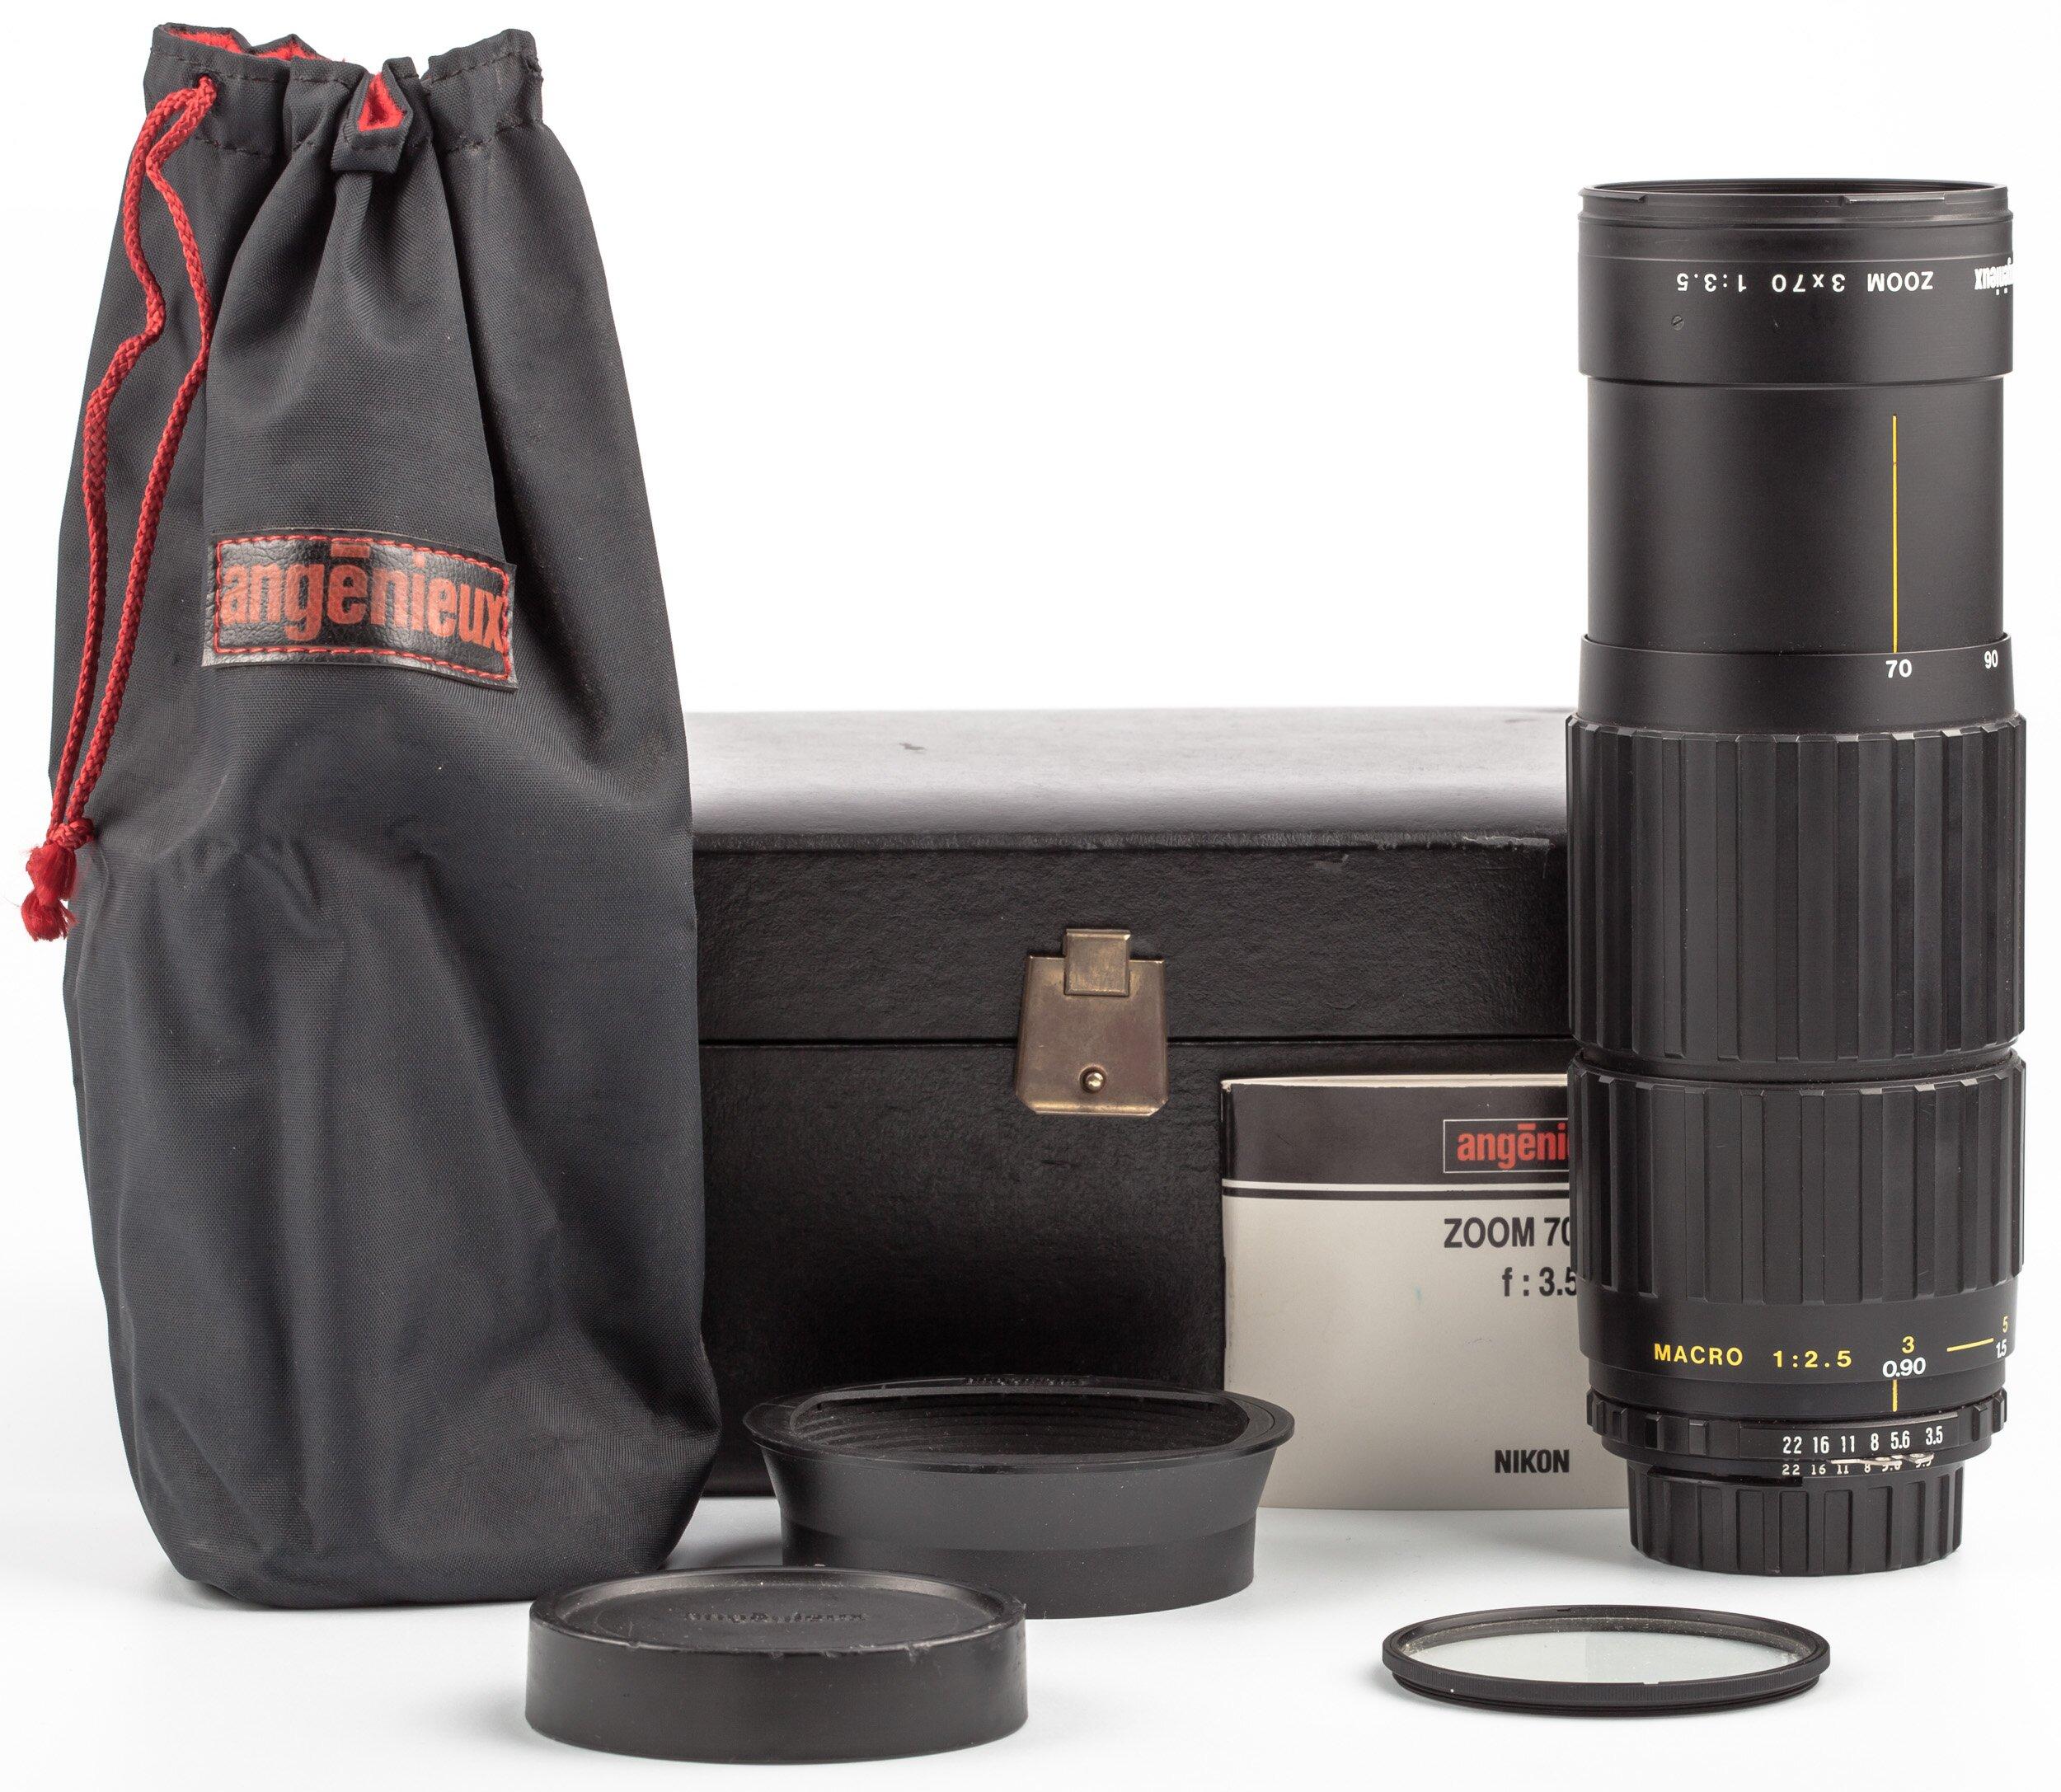 Angenieux Nikon  3,5/70-210mm